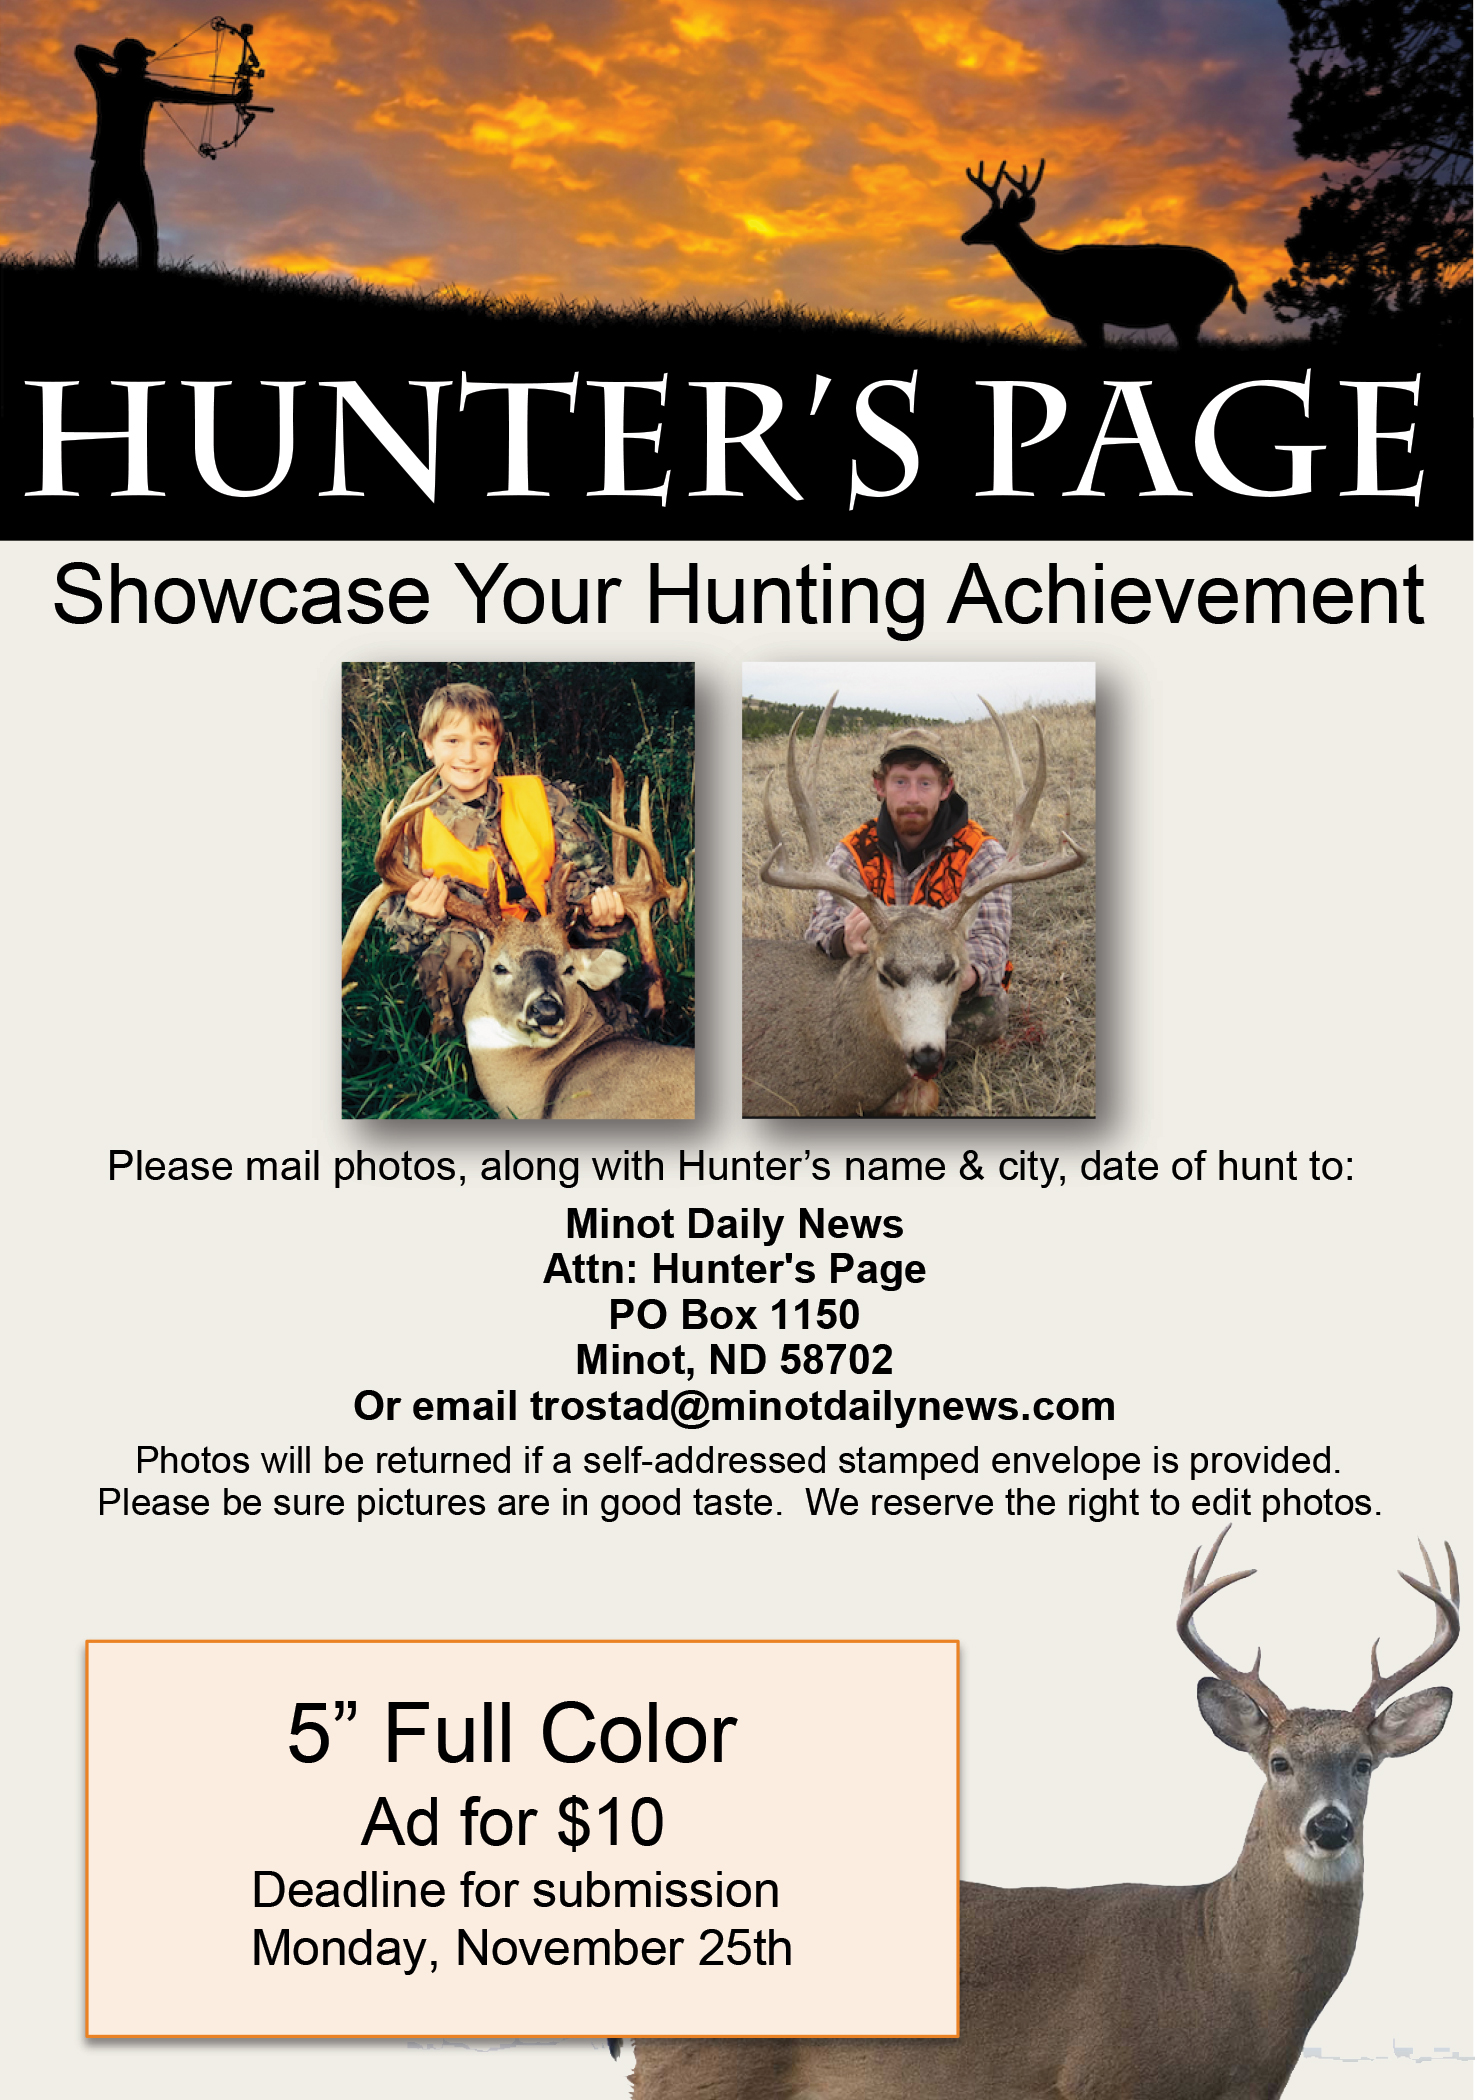 HuntersPage